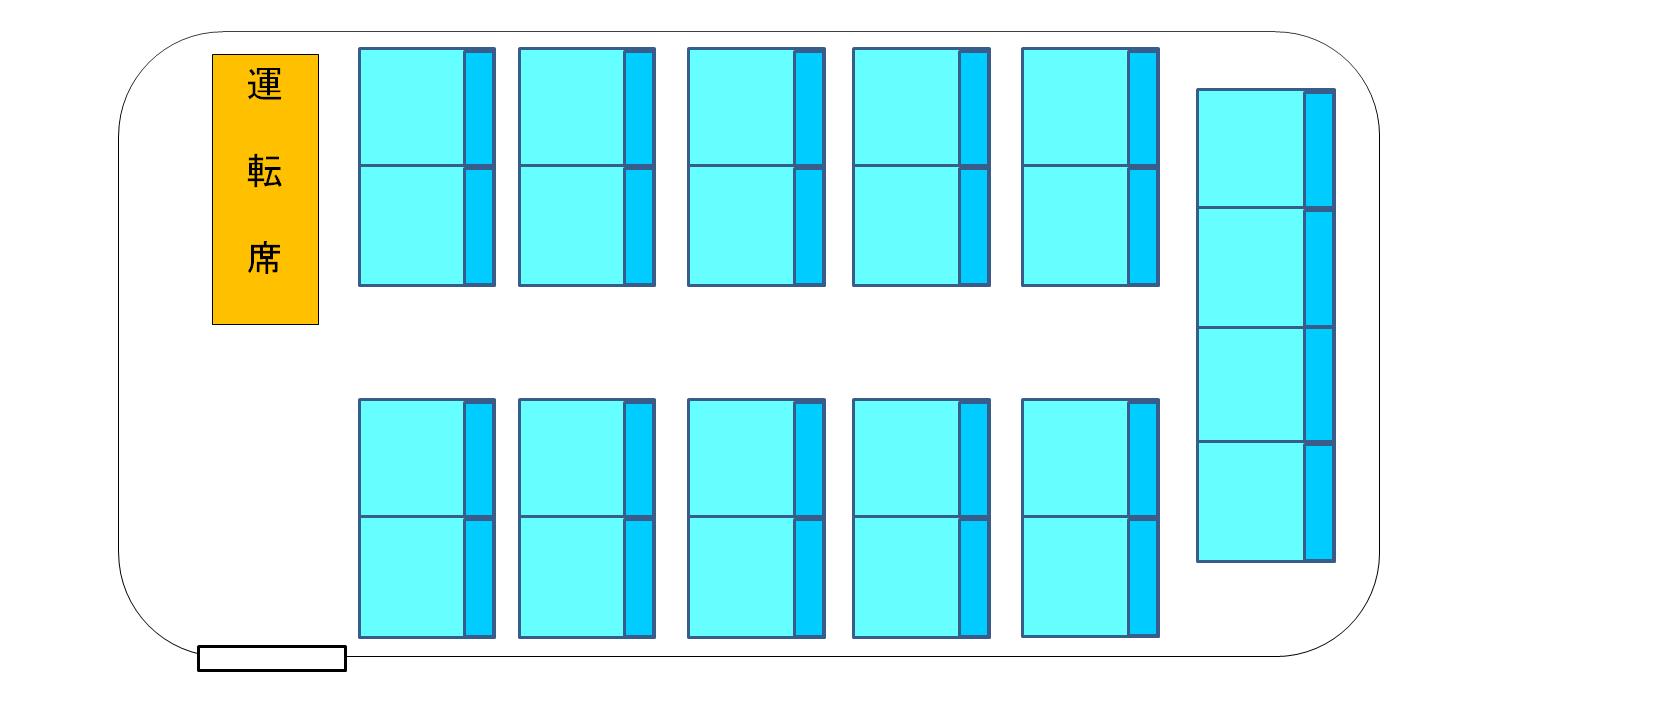 small_sheet02.png